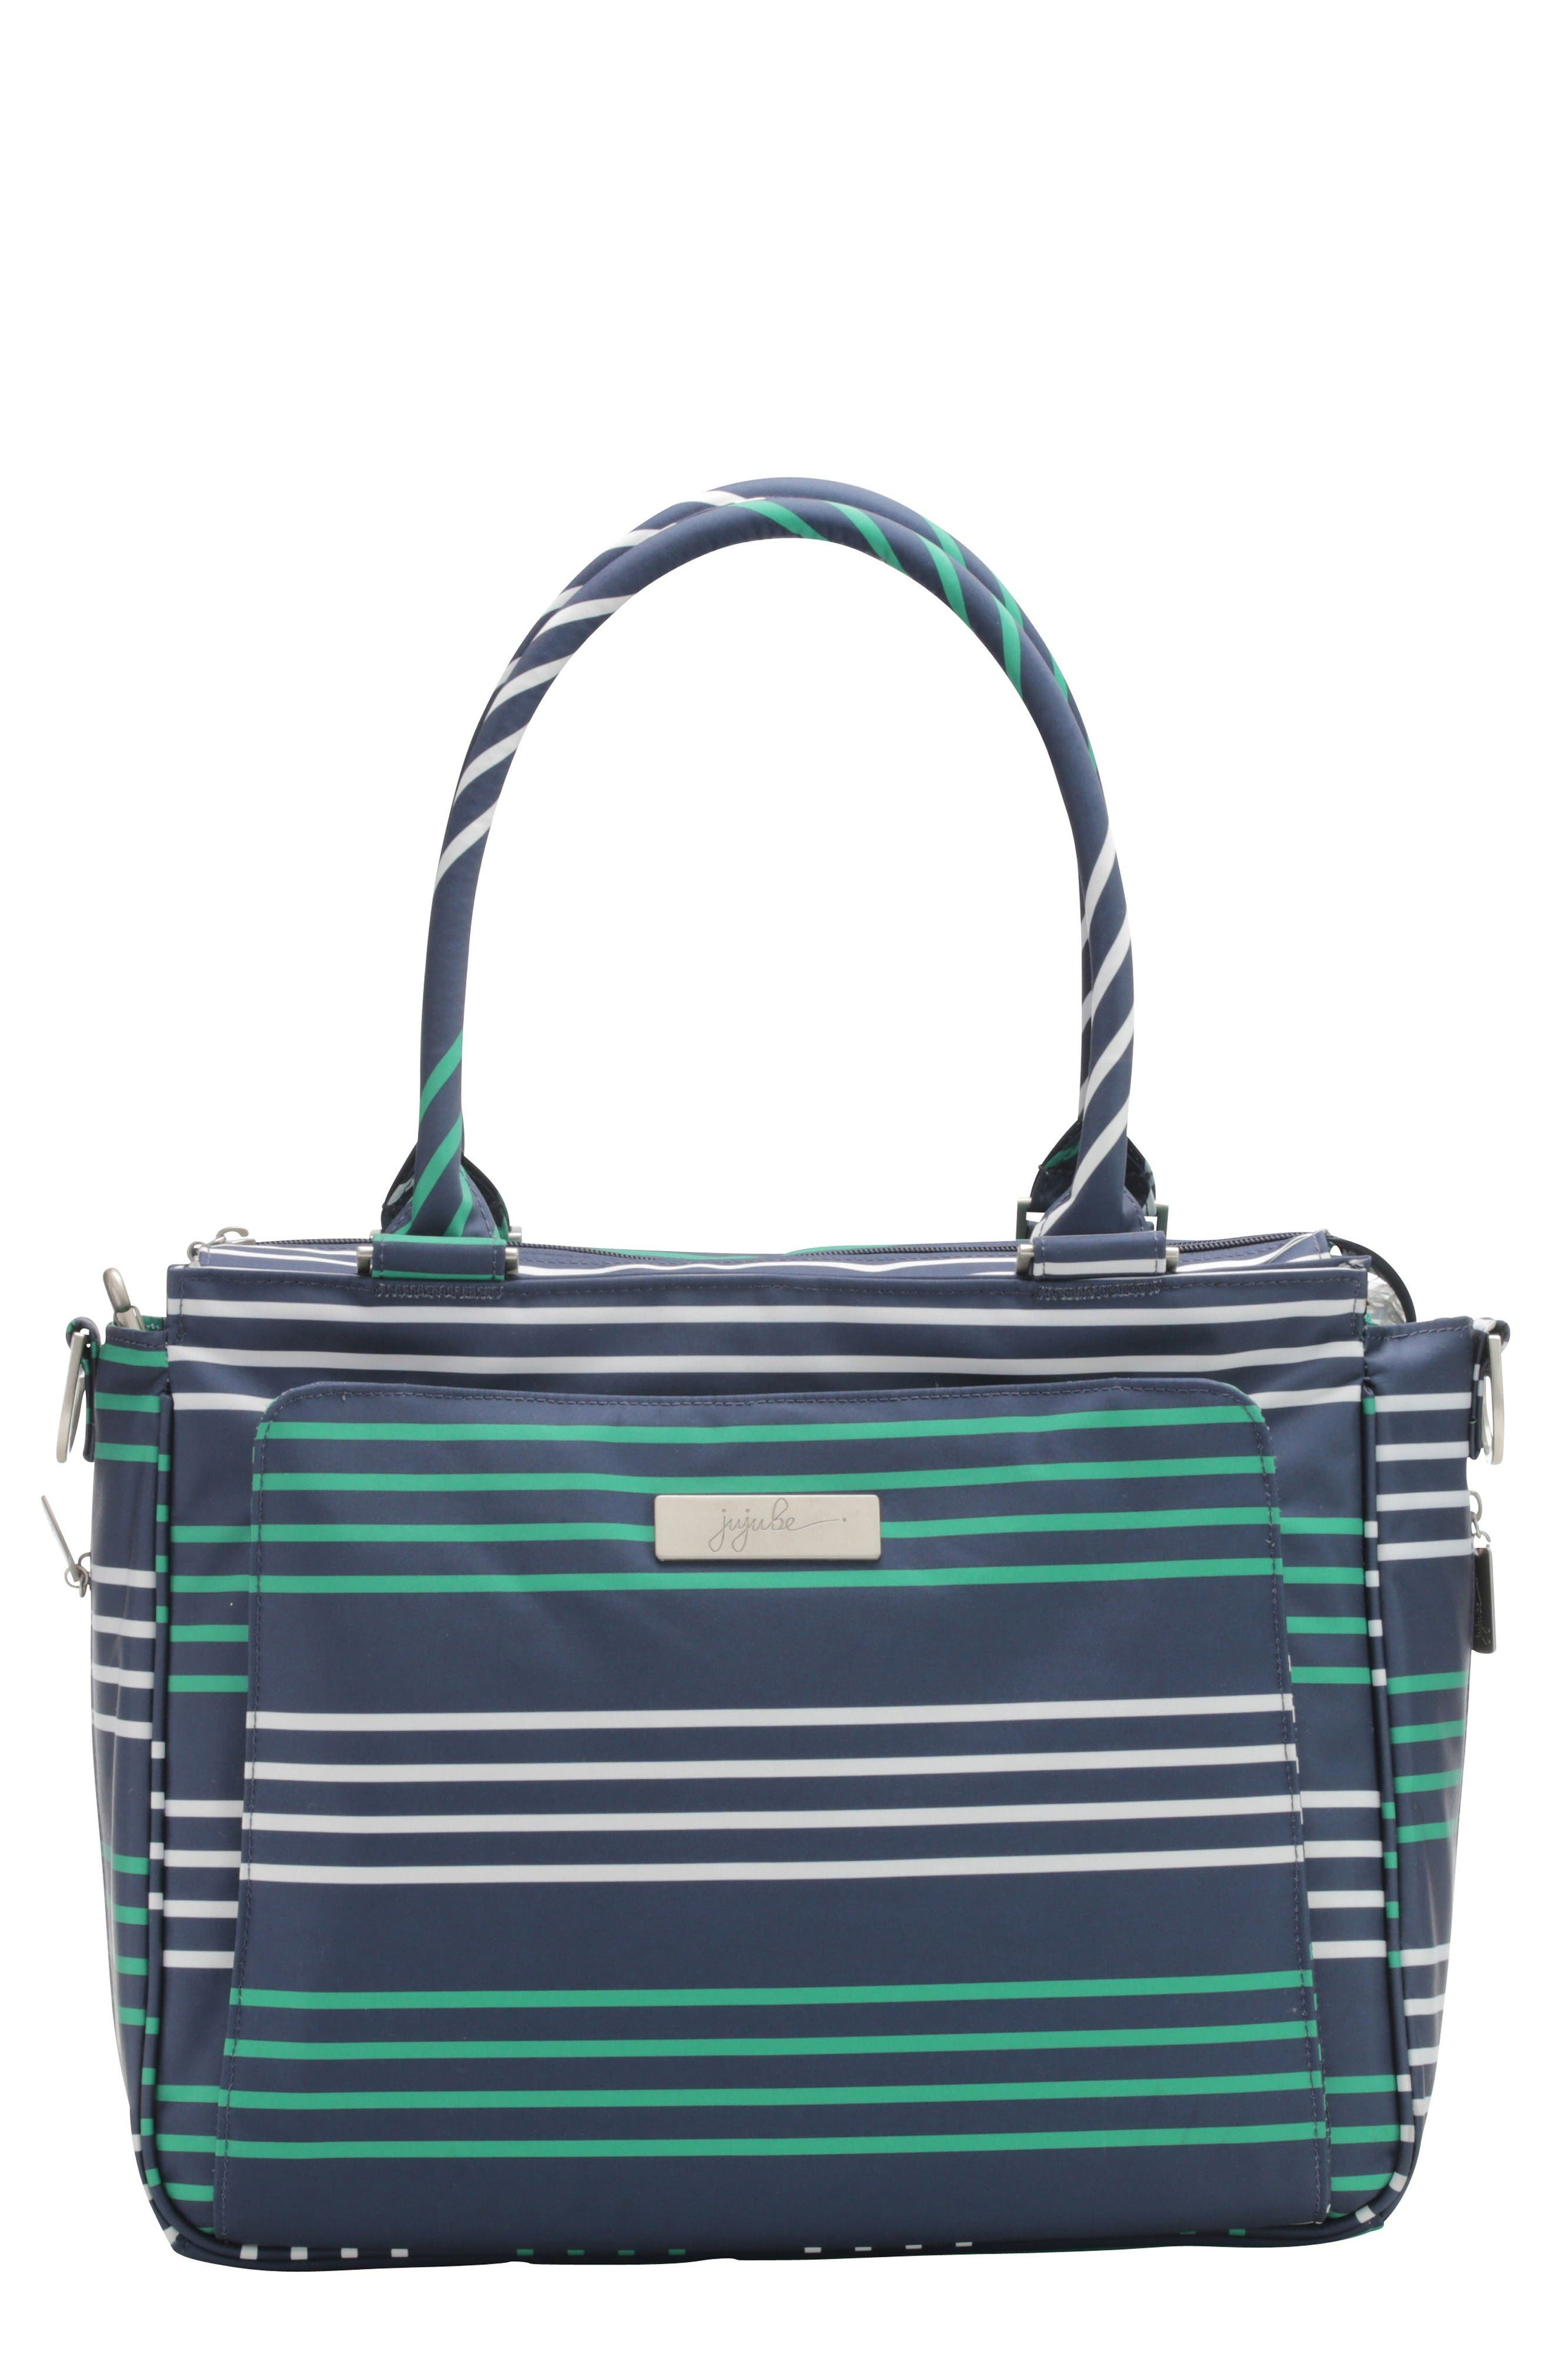 Alternate Image 1 Selected - Ju-Ju-Be Be Classy - Coastal Collection Diaper Bag